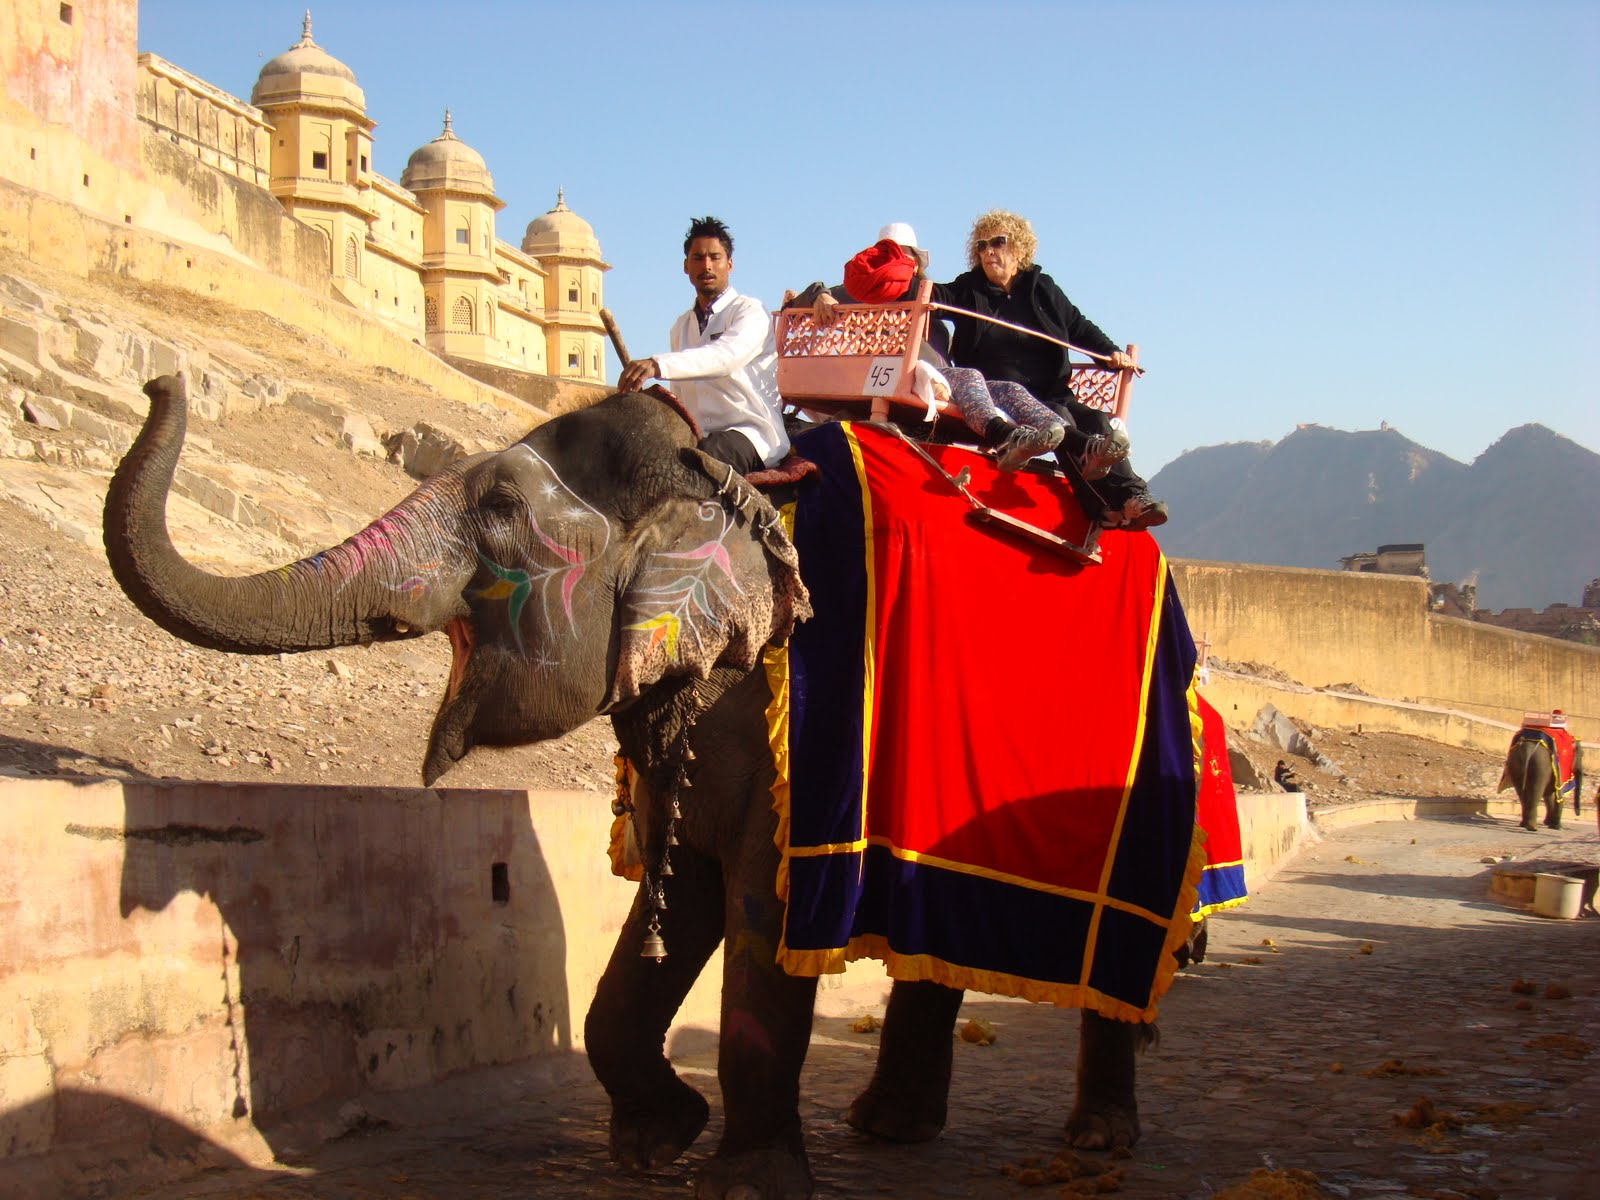 cosas que hacer en la india, india, la india, cosas que hacer, things to do in india, things to do, bombay, taj mahal, delhi